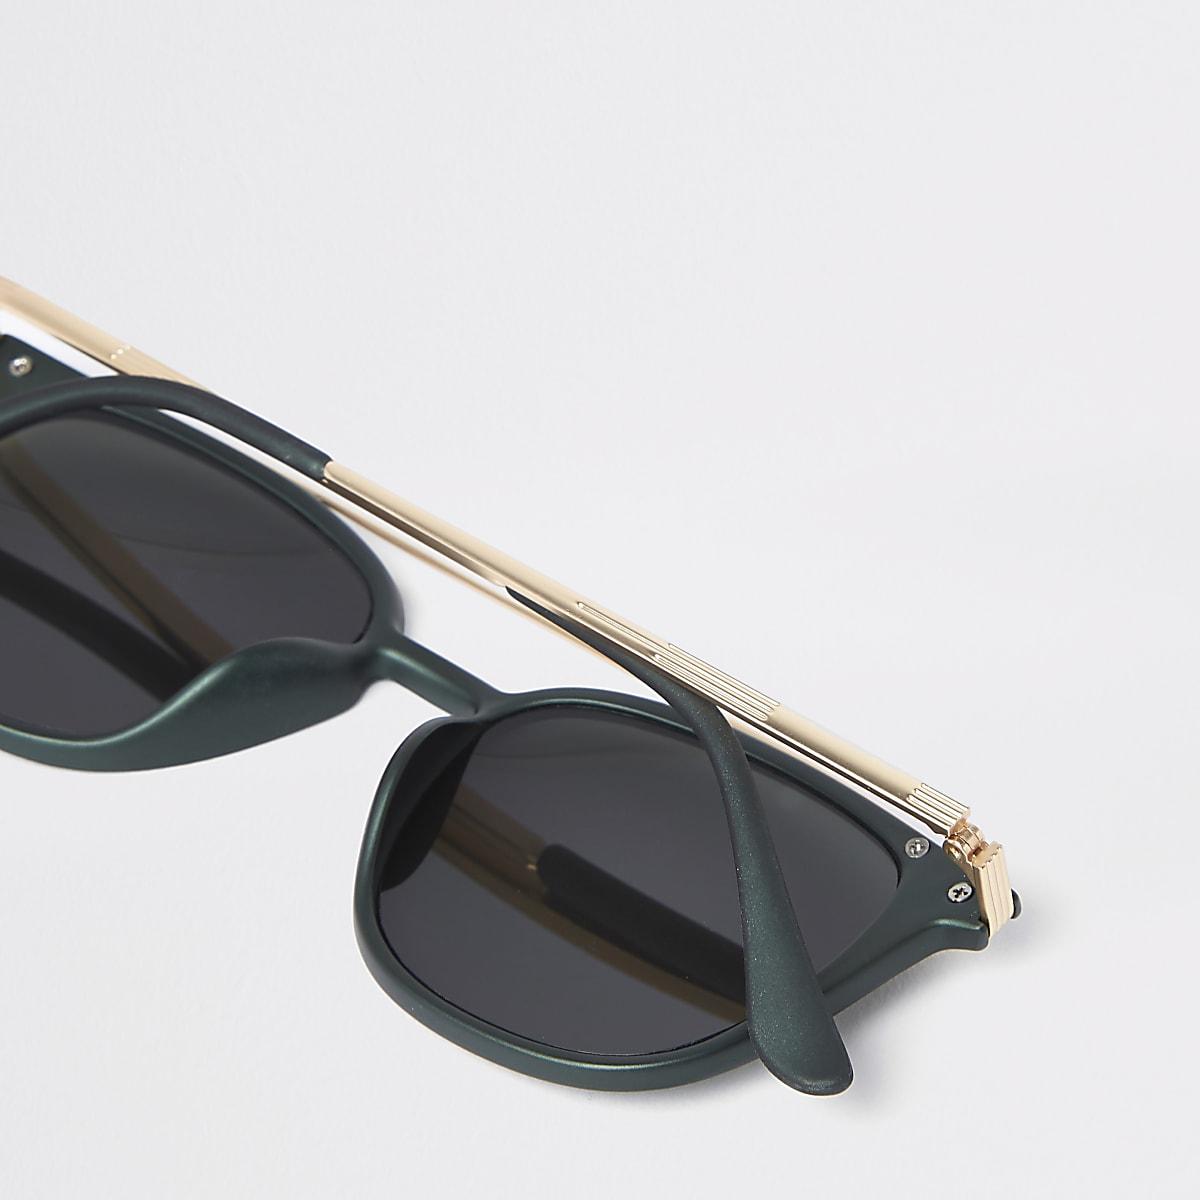 df60d3f8d Khaki green brow bar navigator sunglasses - Aviator Sunglasses ...